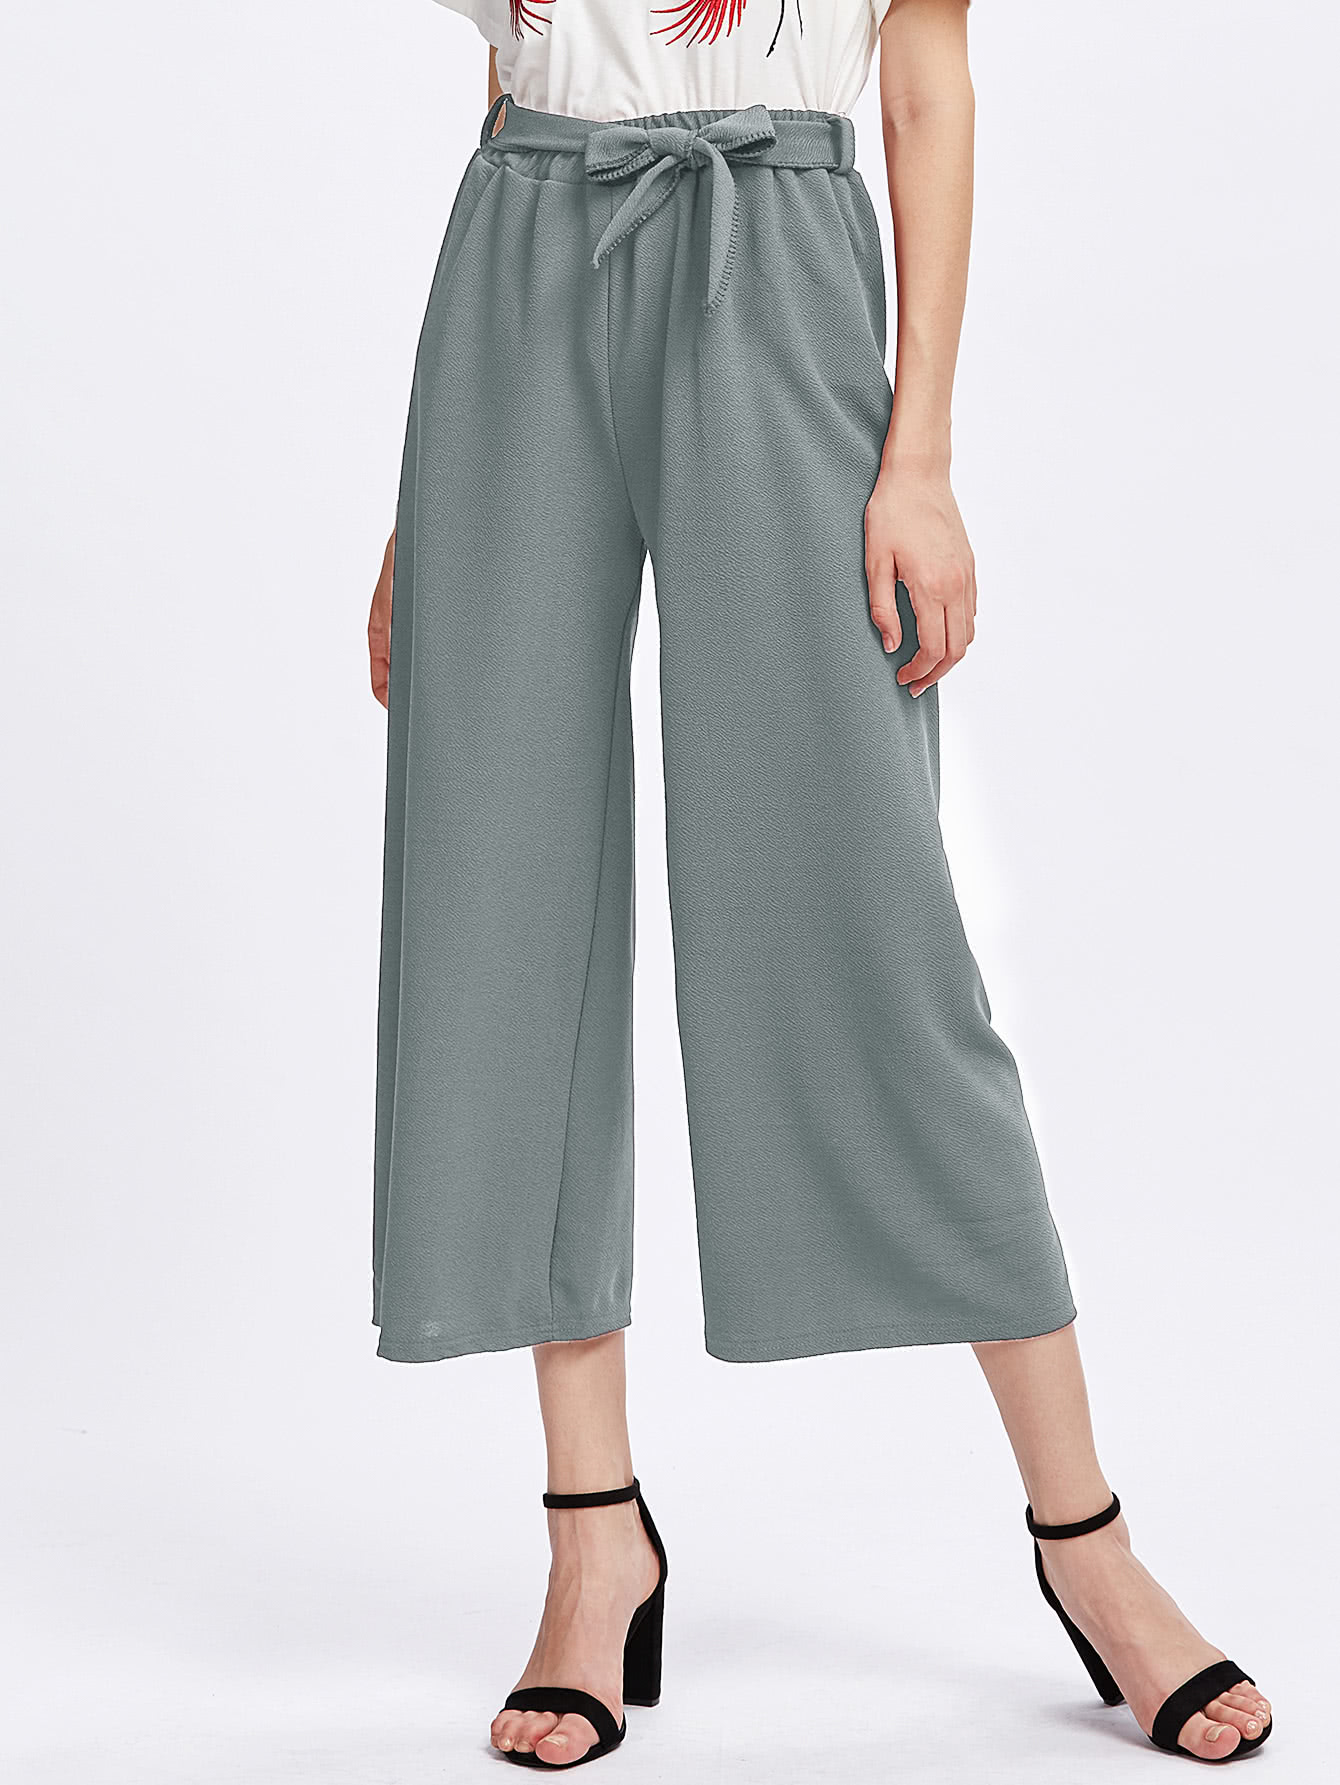 Tie Waist Culotte Pants